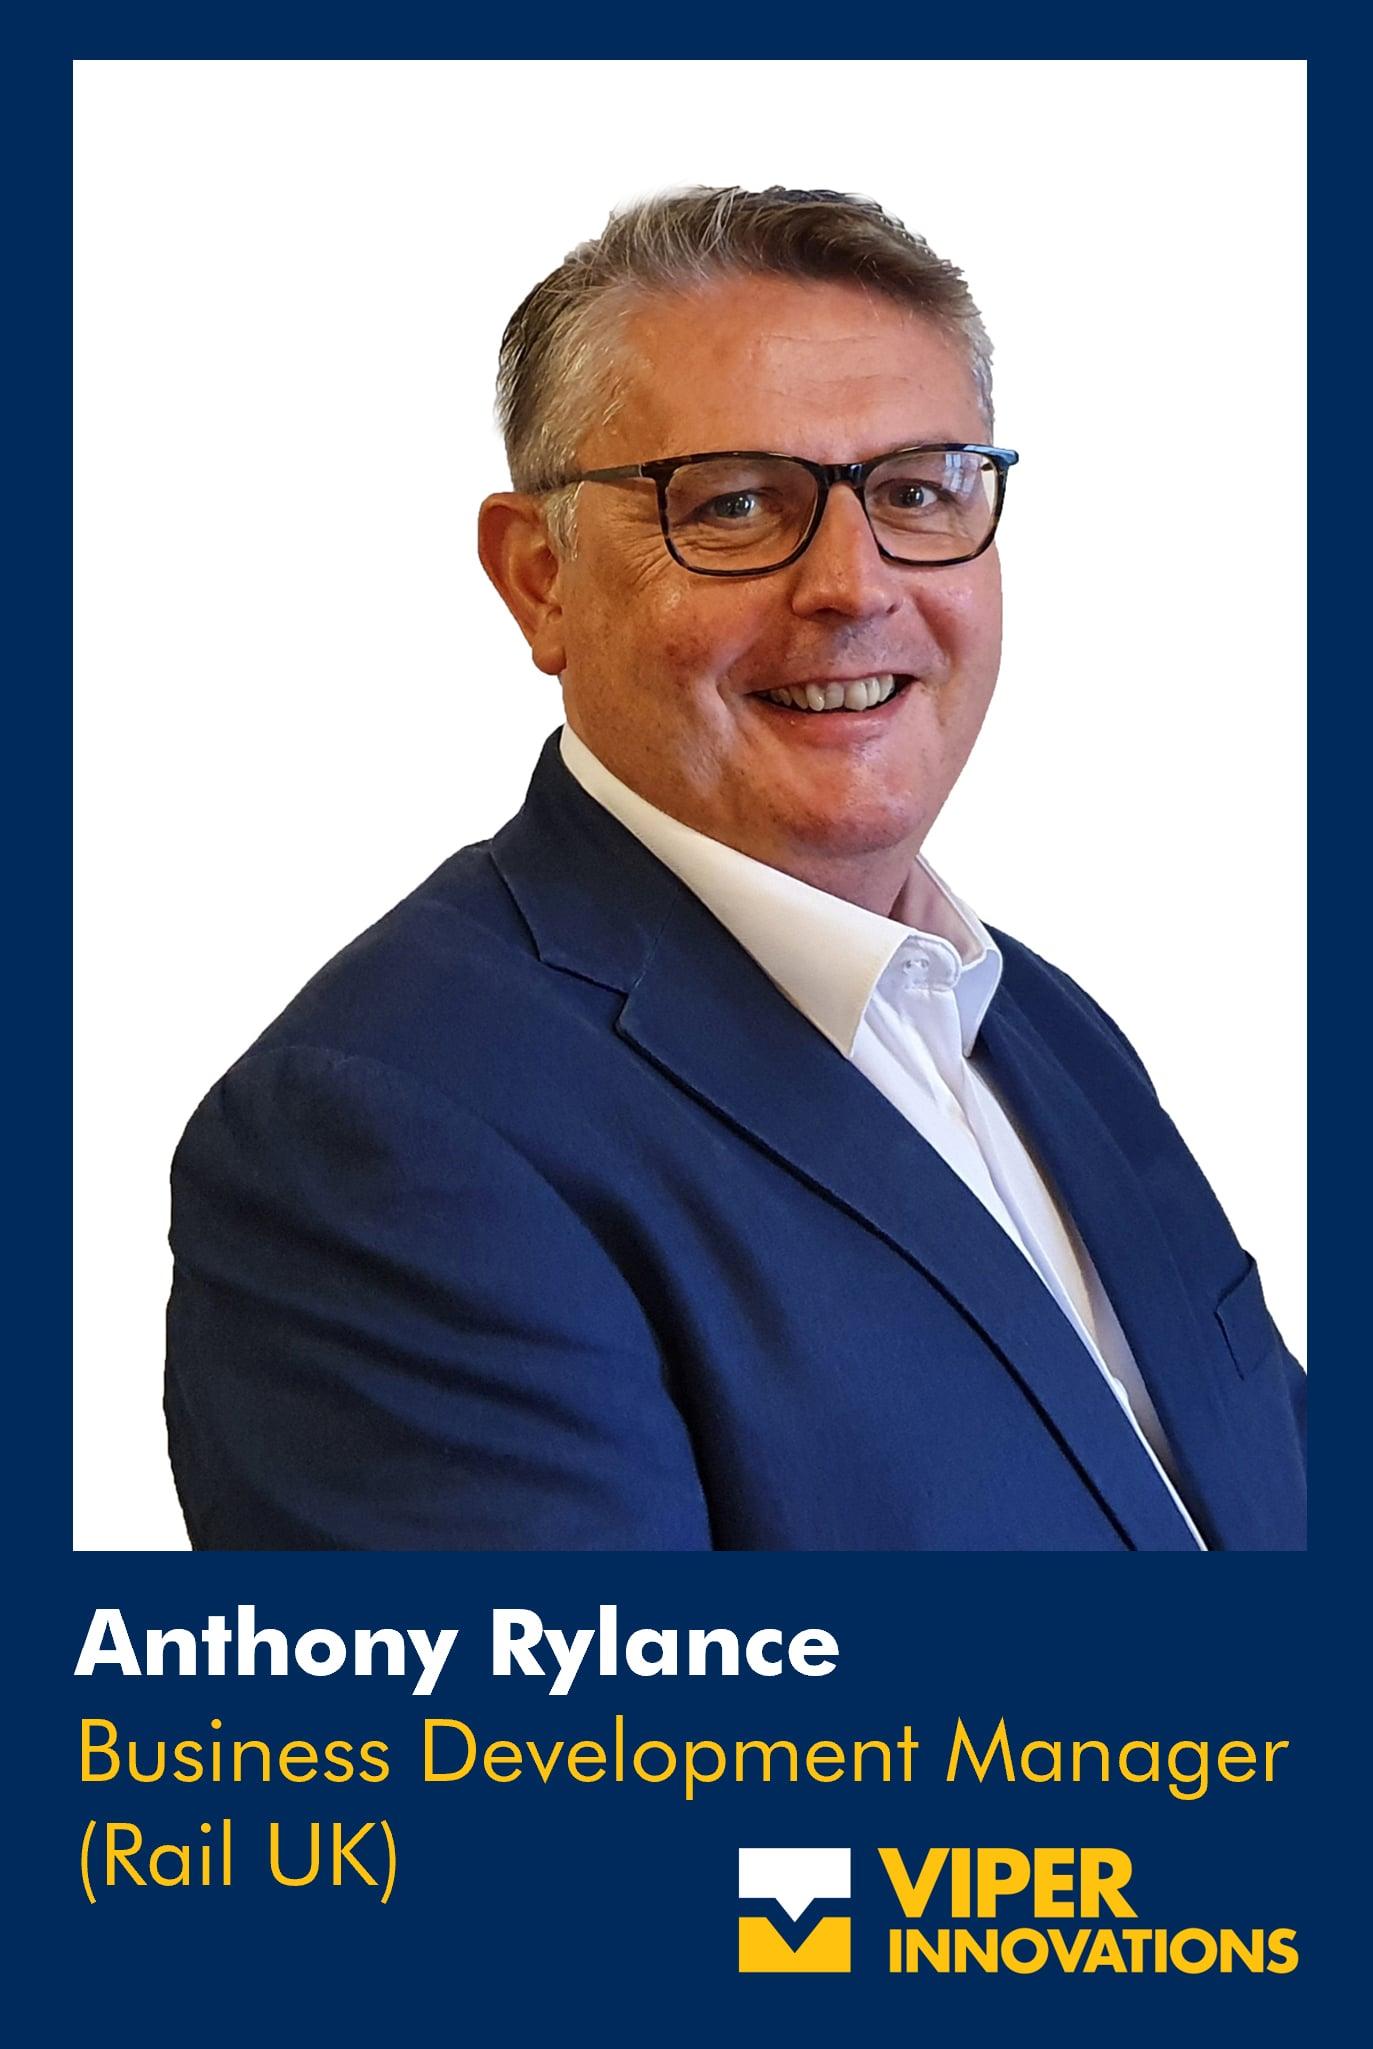 Anthony Rylance Business Development